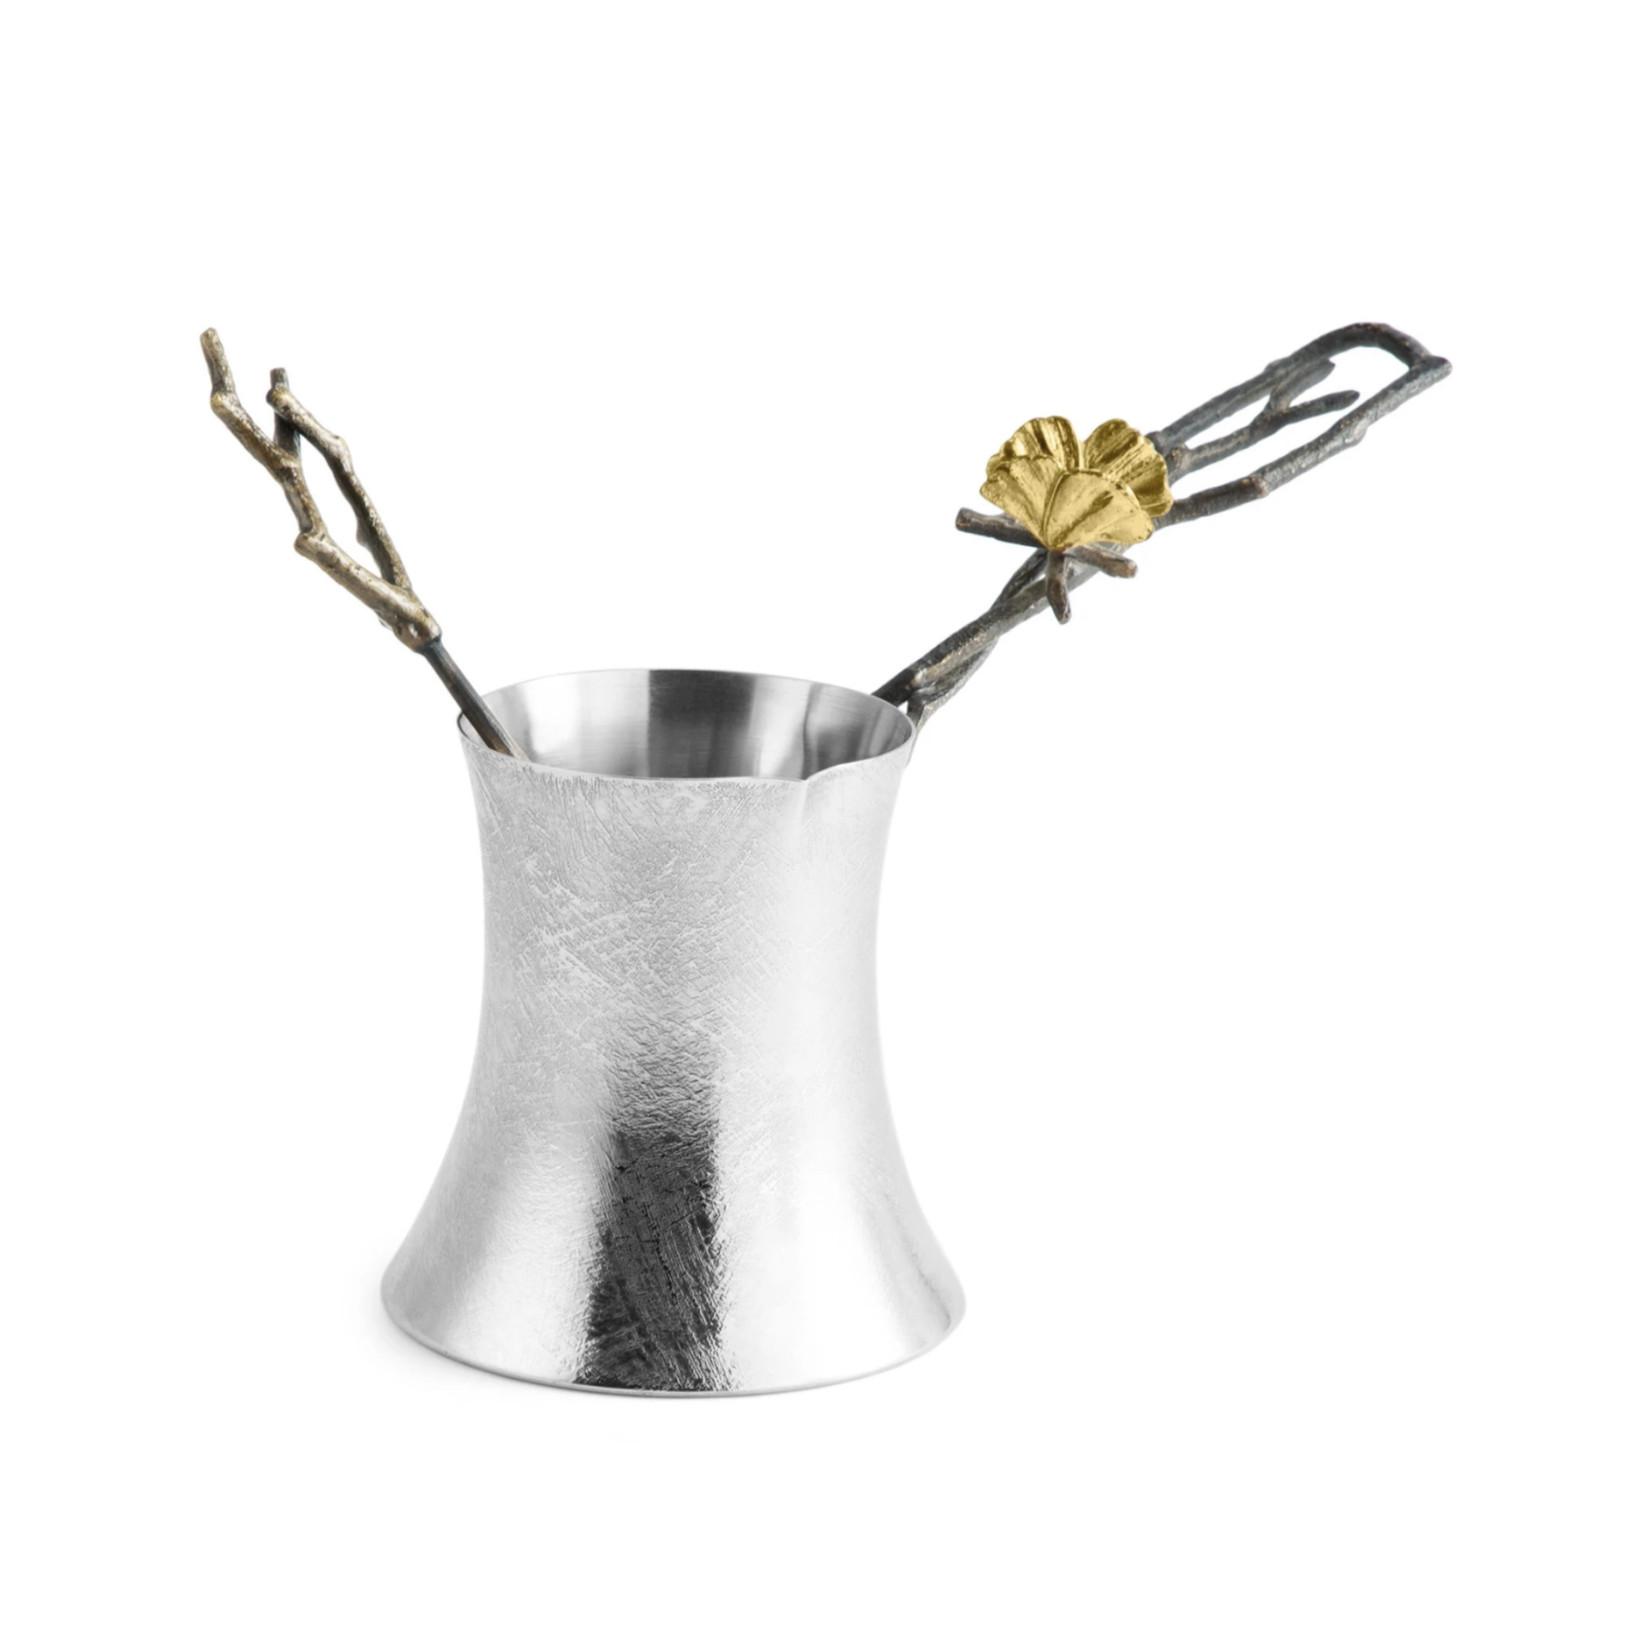 Michael Aram Butterfly Ginkgo Coffee Pot with Spoon